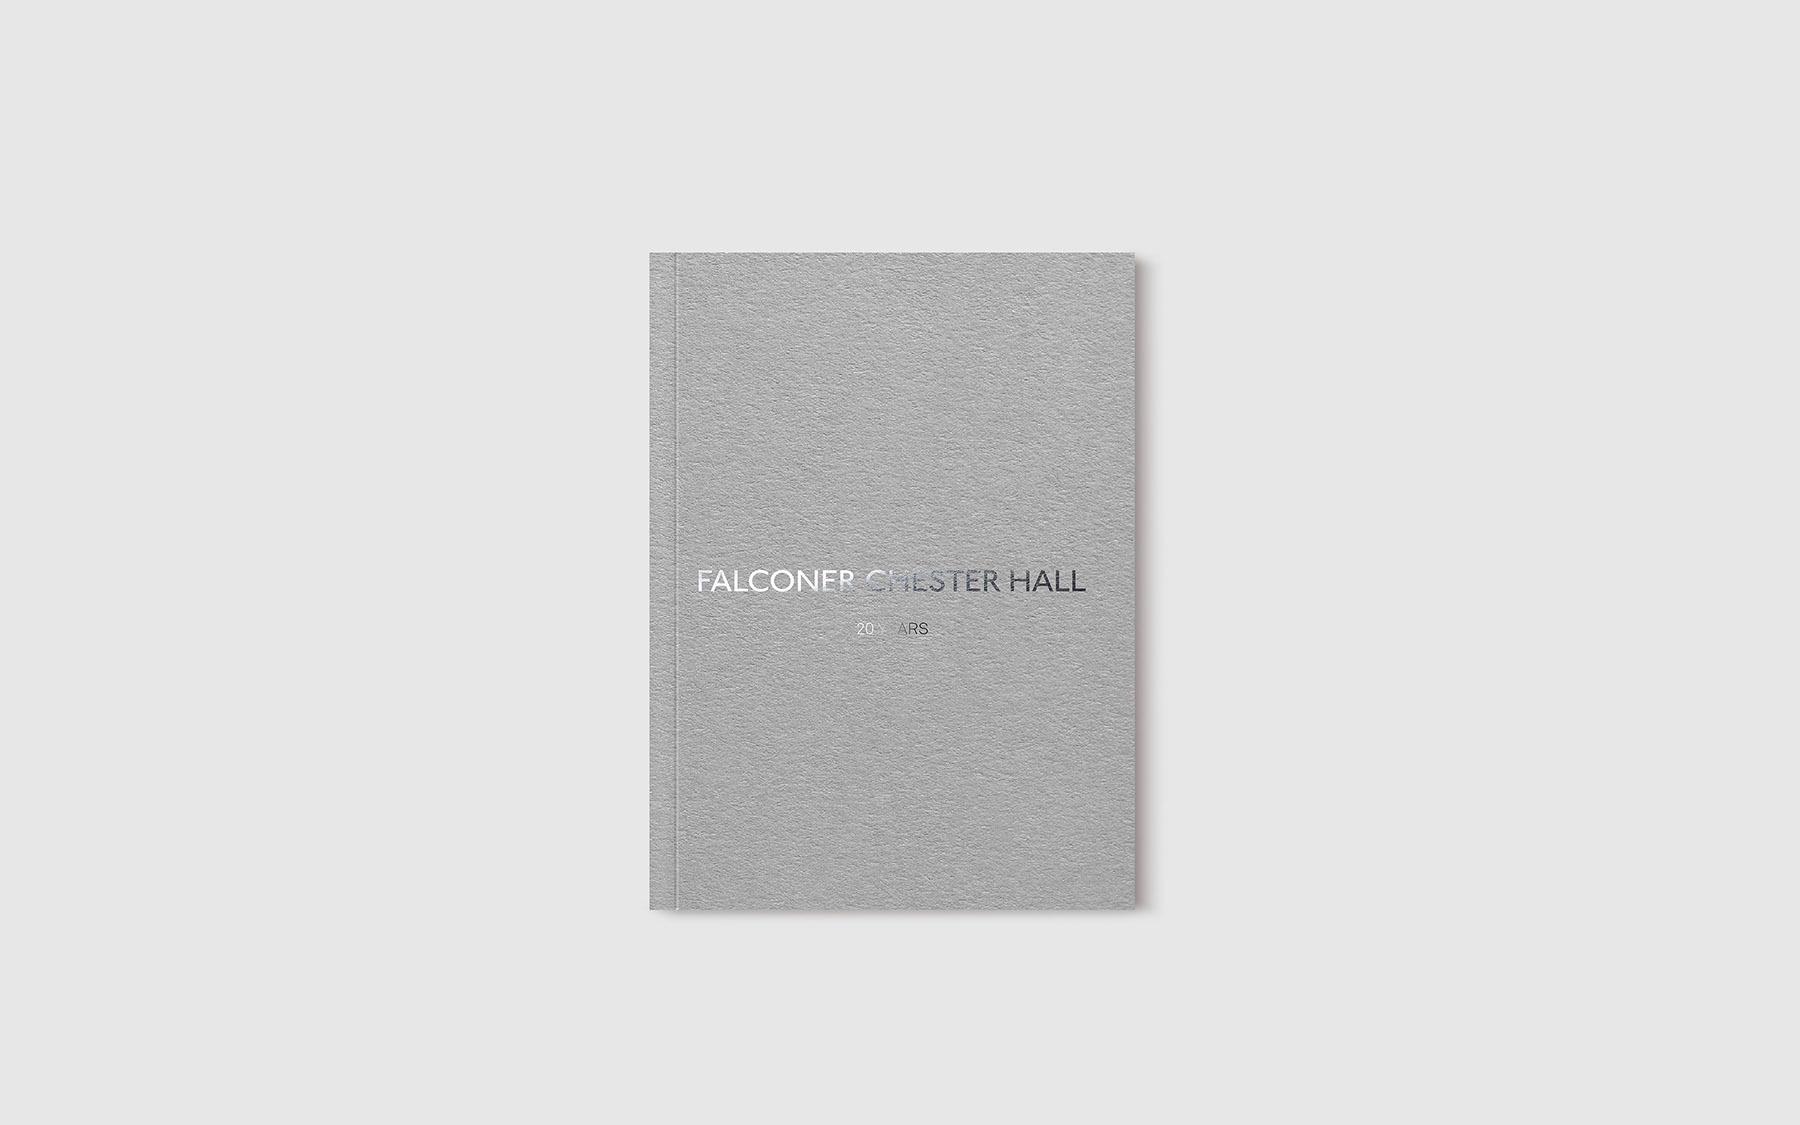 falconer chester hall brochure design by Leeds based Freelance Designer Neil Holroyd